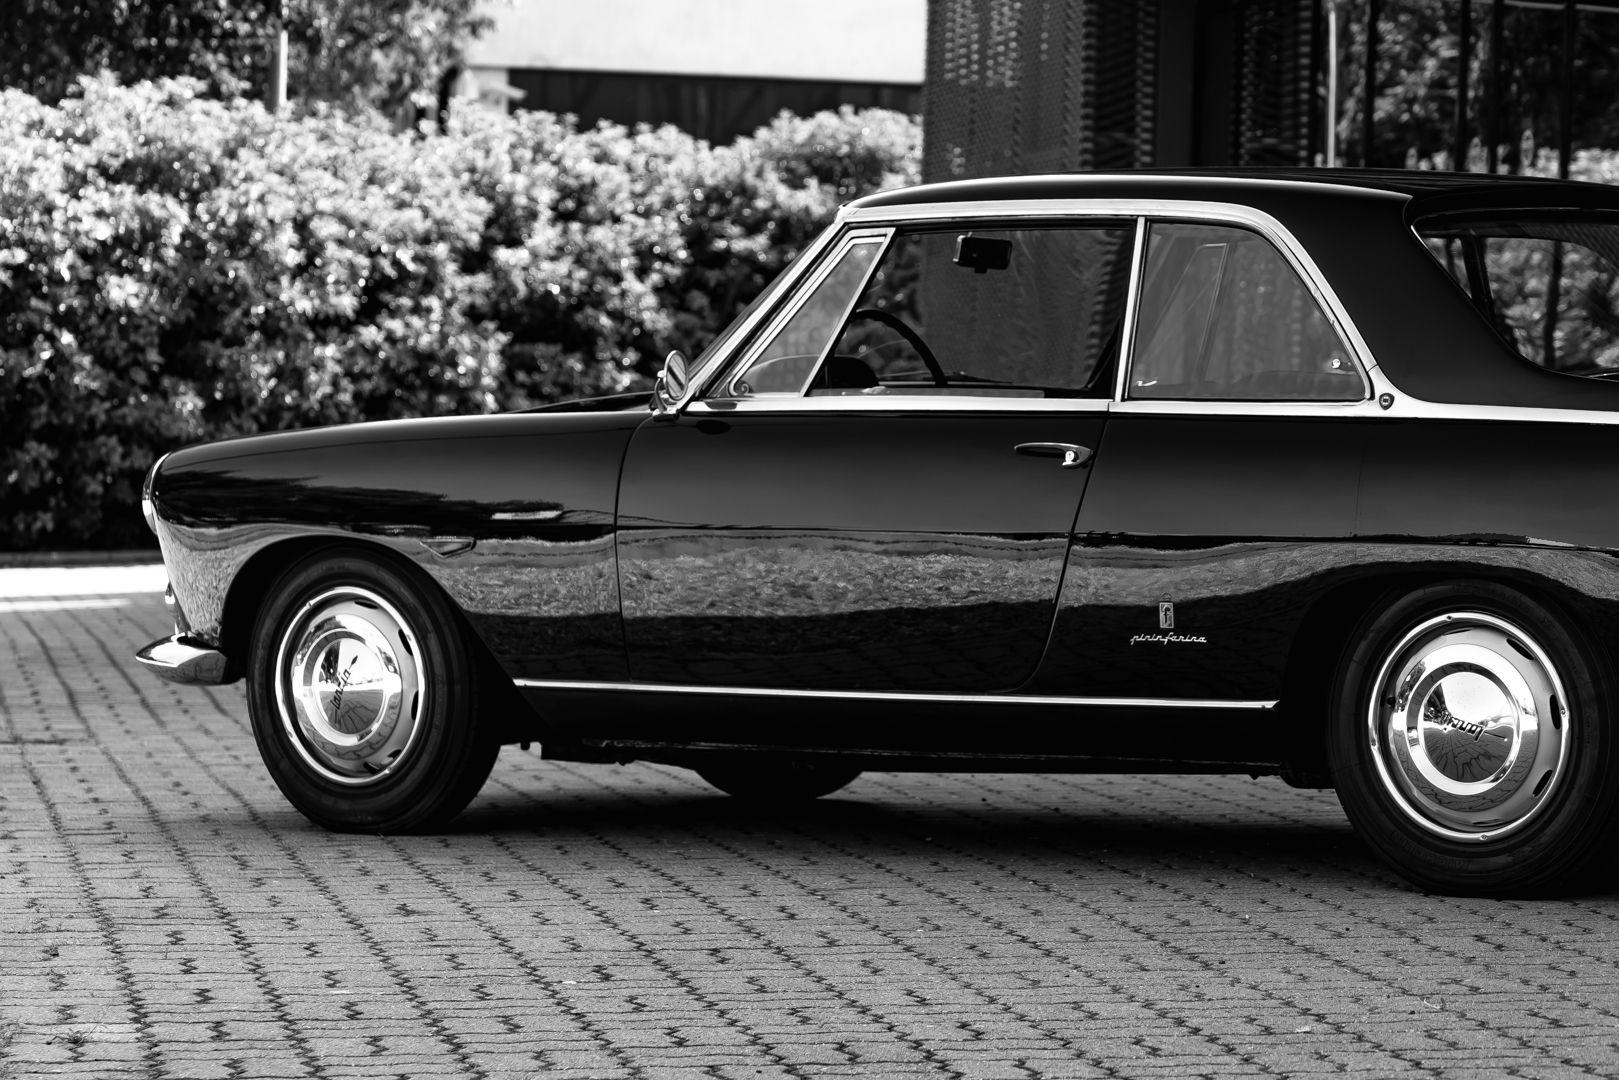 1960 Lancia Flaminia Coupé Pininfarina 2.5 76044